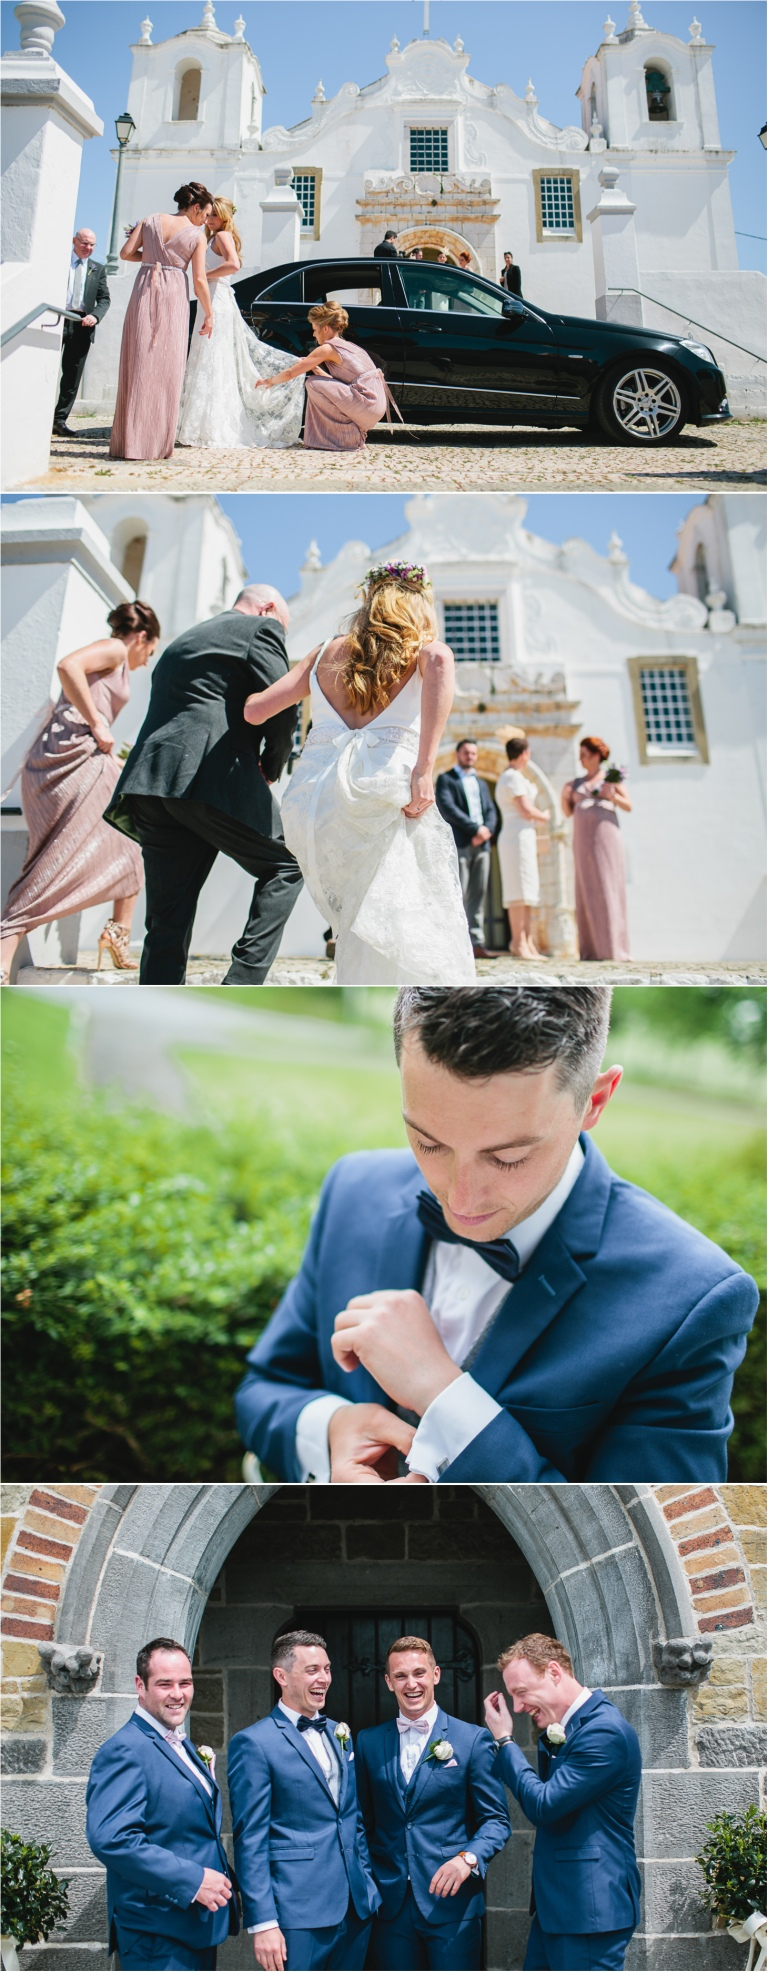 17-darren-fitzpatrick-photography-blog